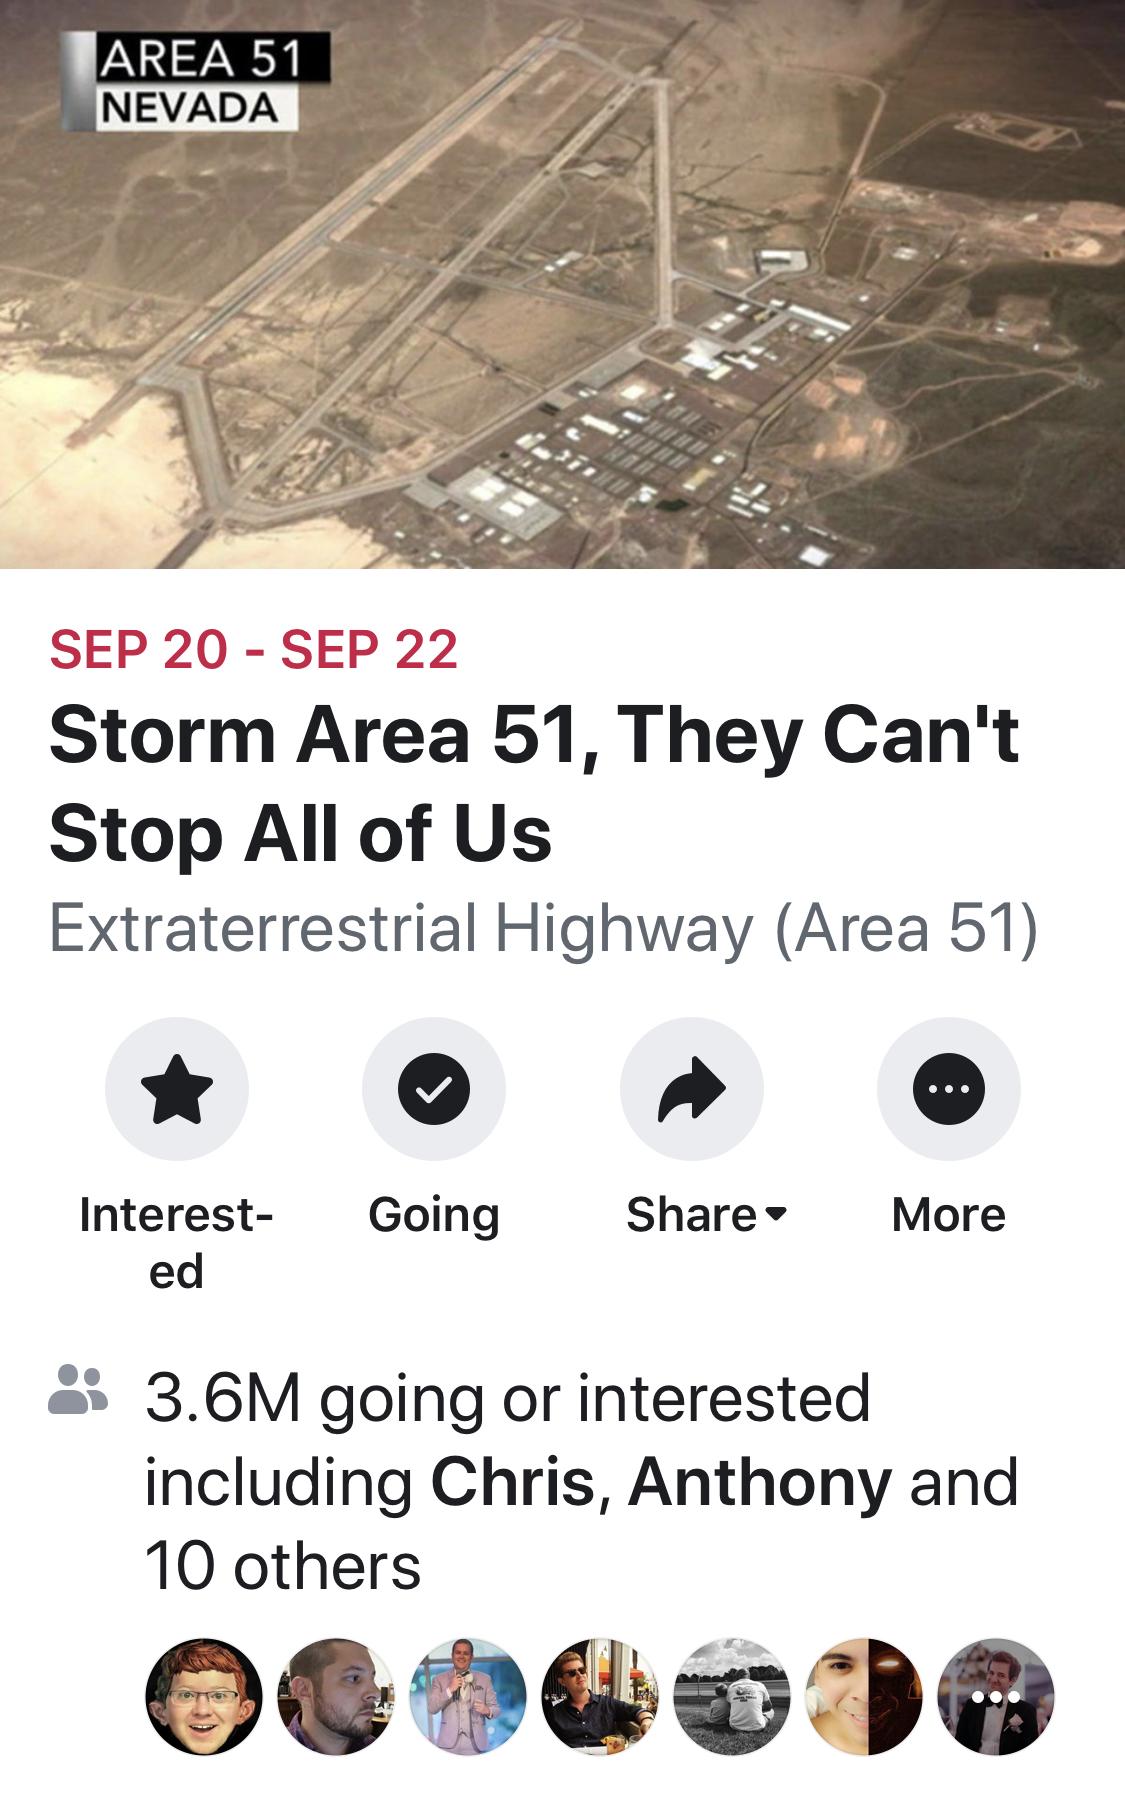 The Joke That Became Real: Raiding Area 51